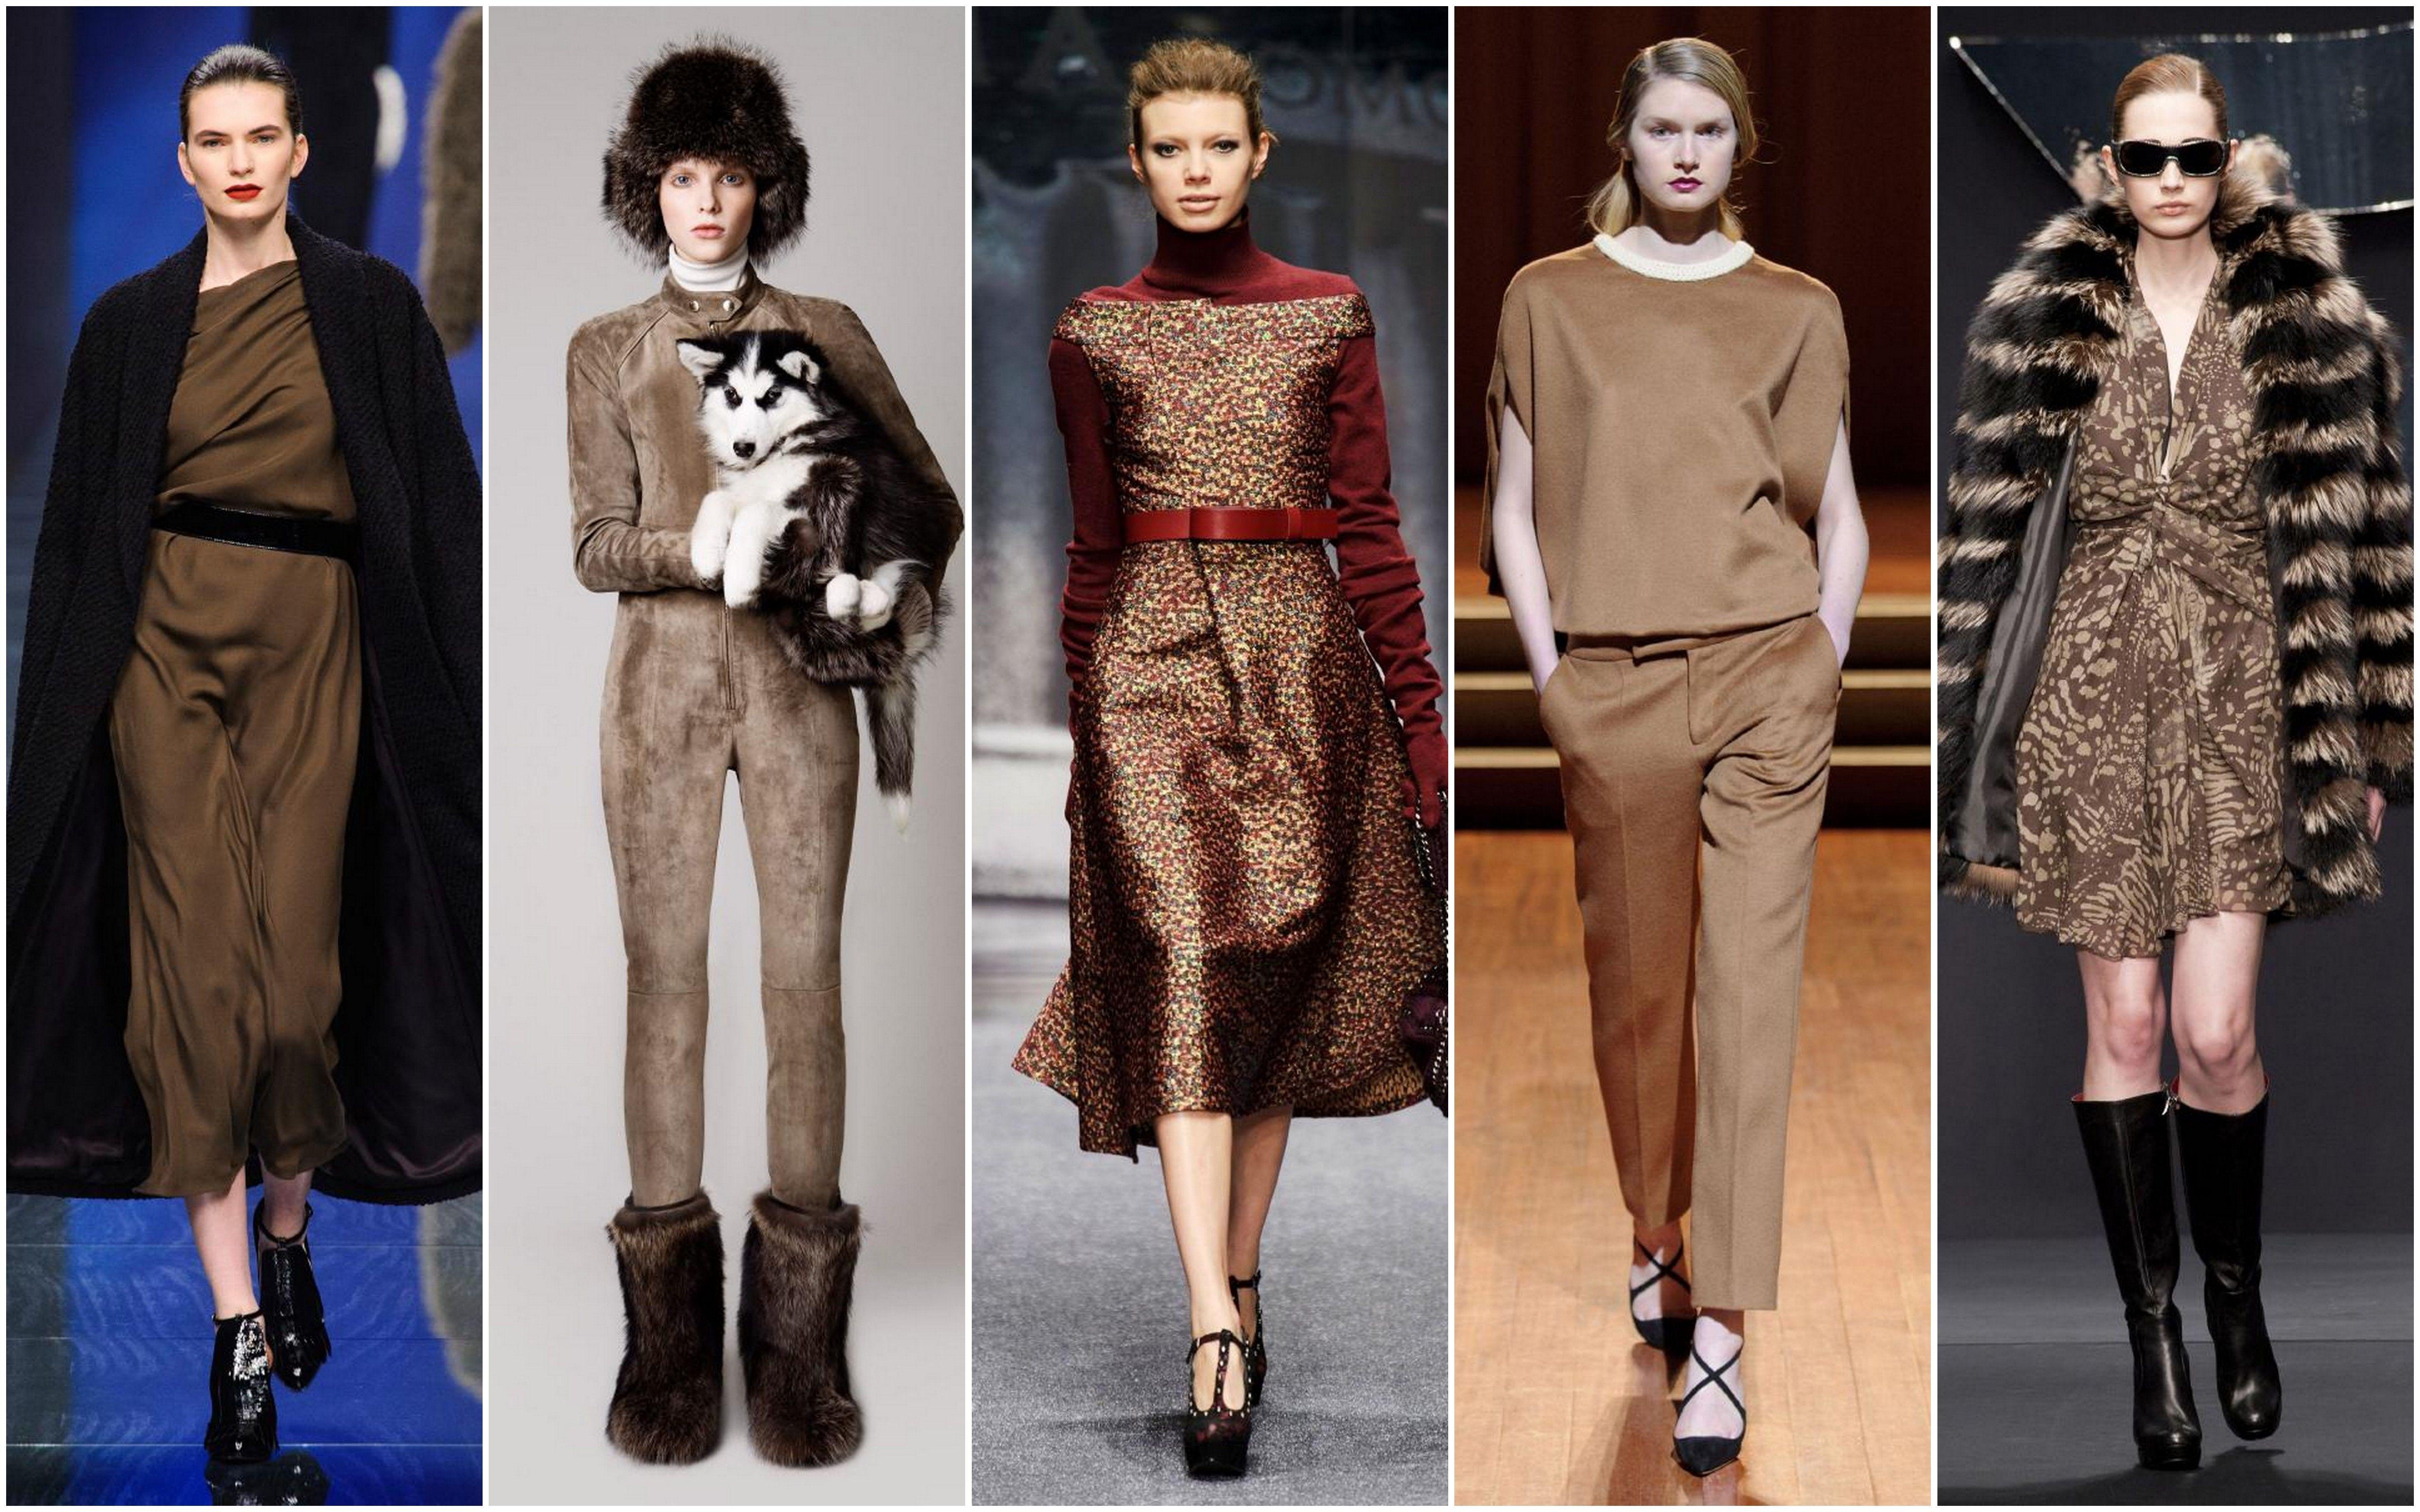 Yellow | Fashion week, London fashion week, Fashion